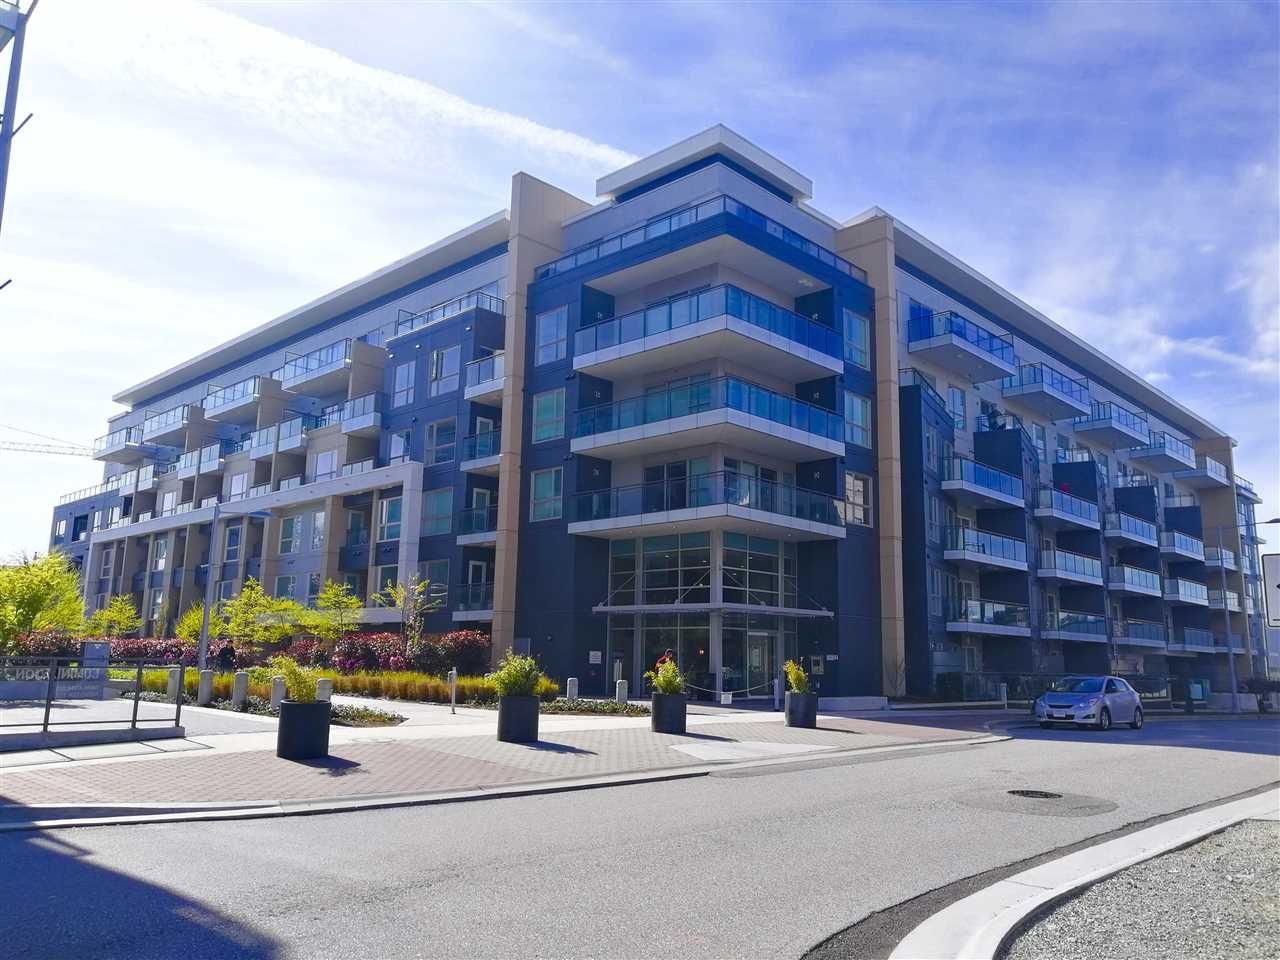 Main Photo: 503 5311 CEDARBRIDGE Way in Richmond: Brighouse Condo for sale : MLS®# R2259170